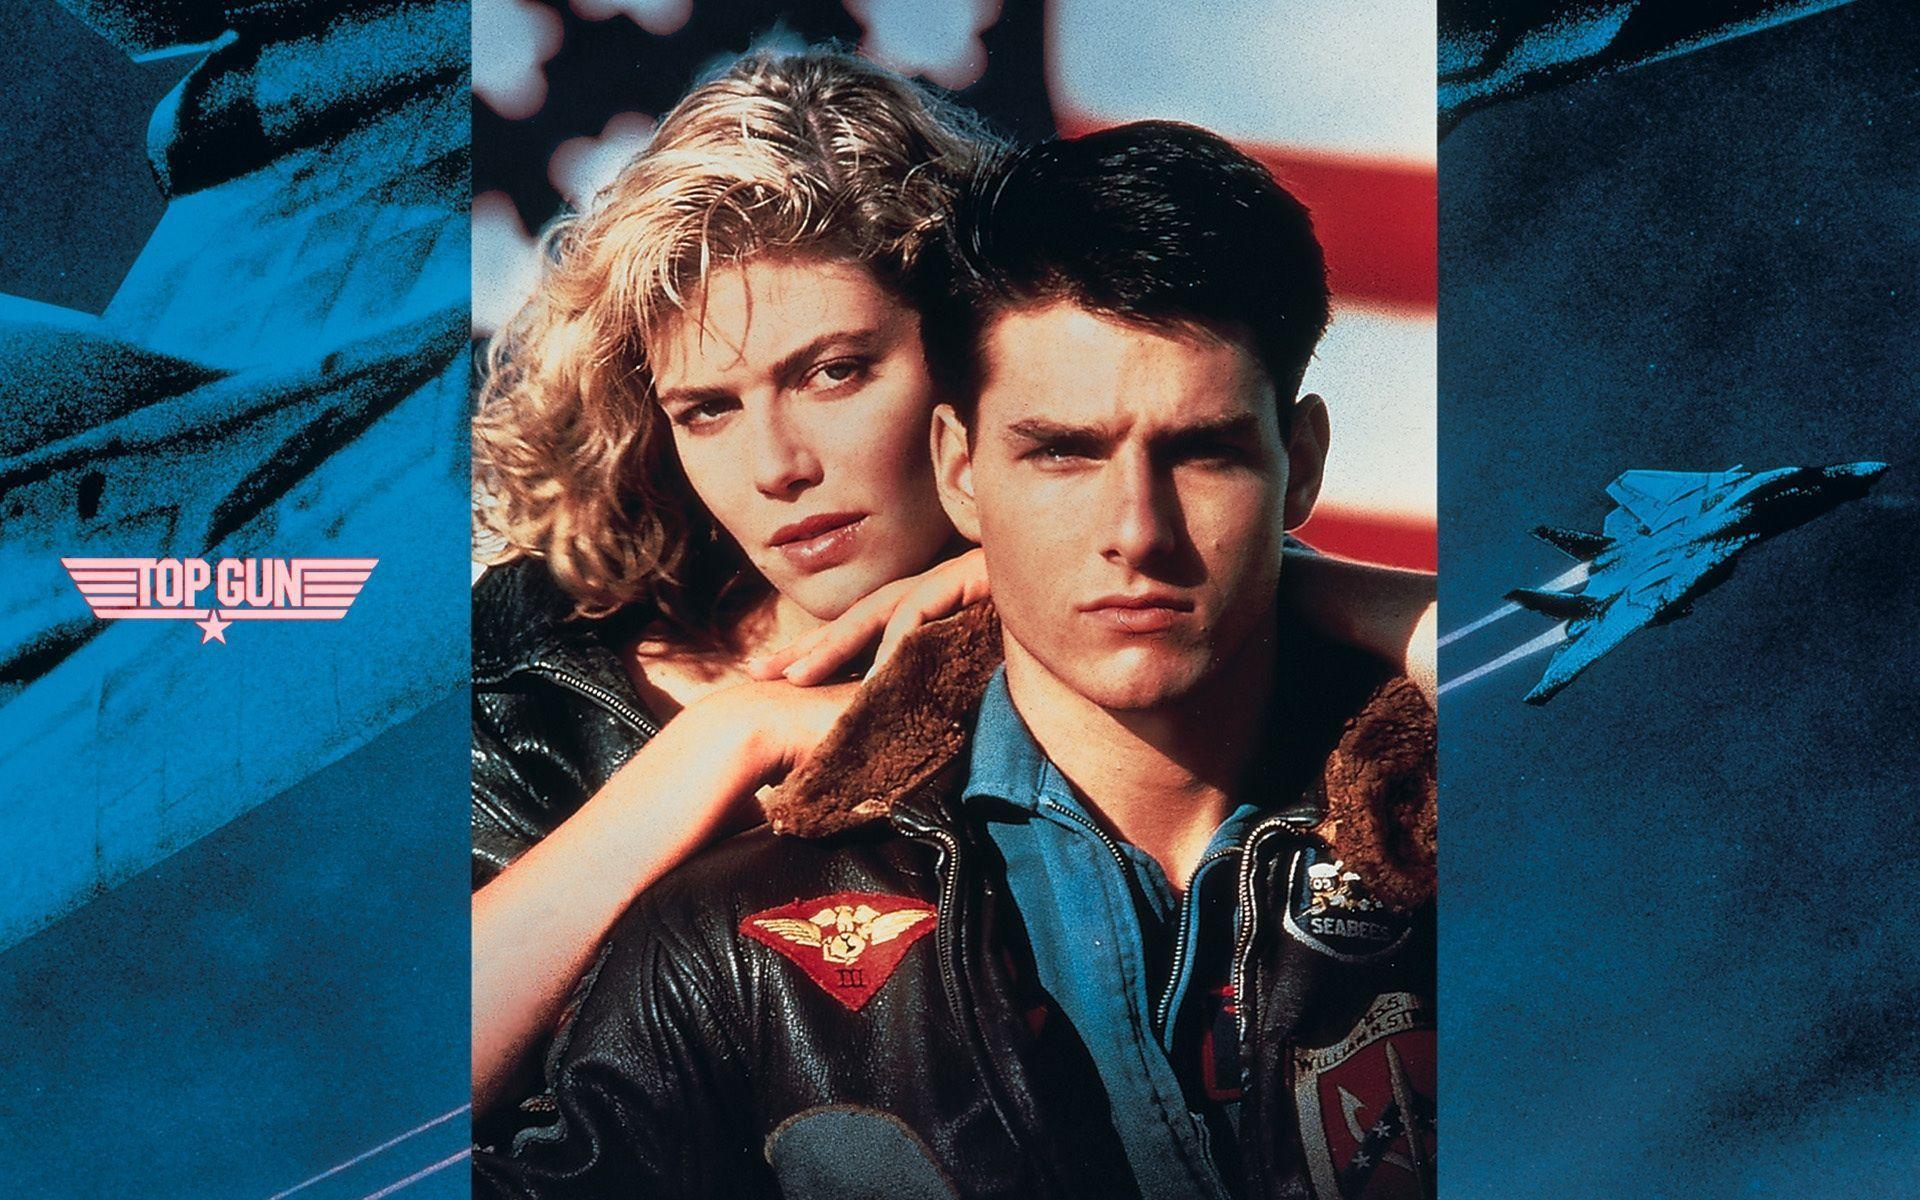 Tom Cruise Wallpaper 1 0 Download